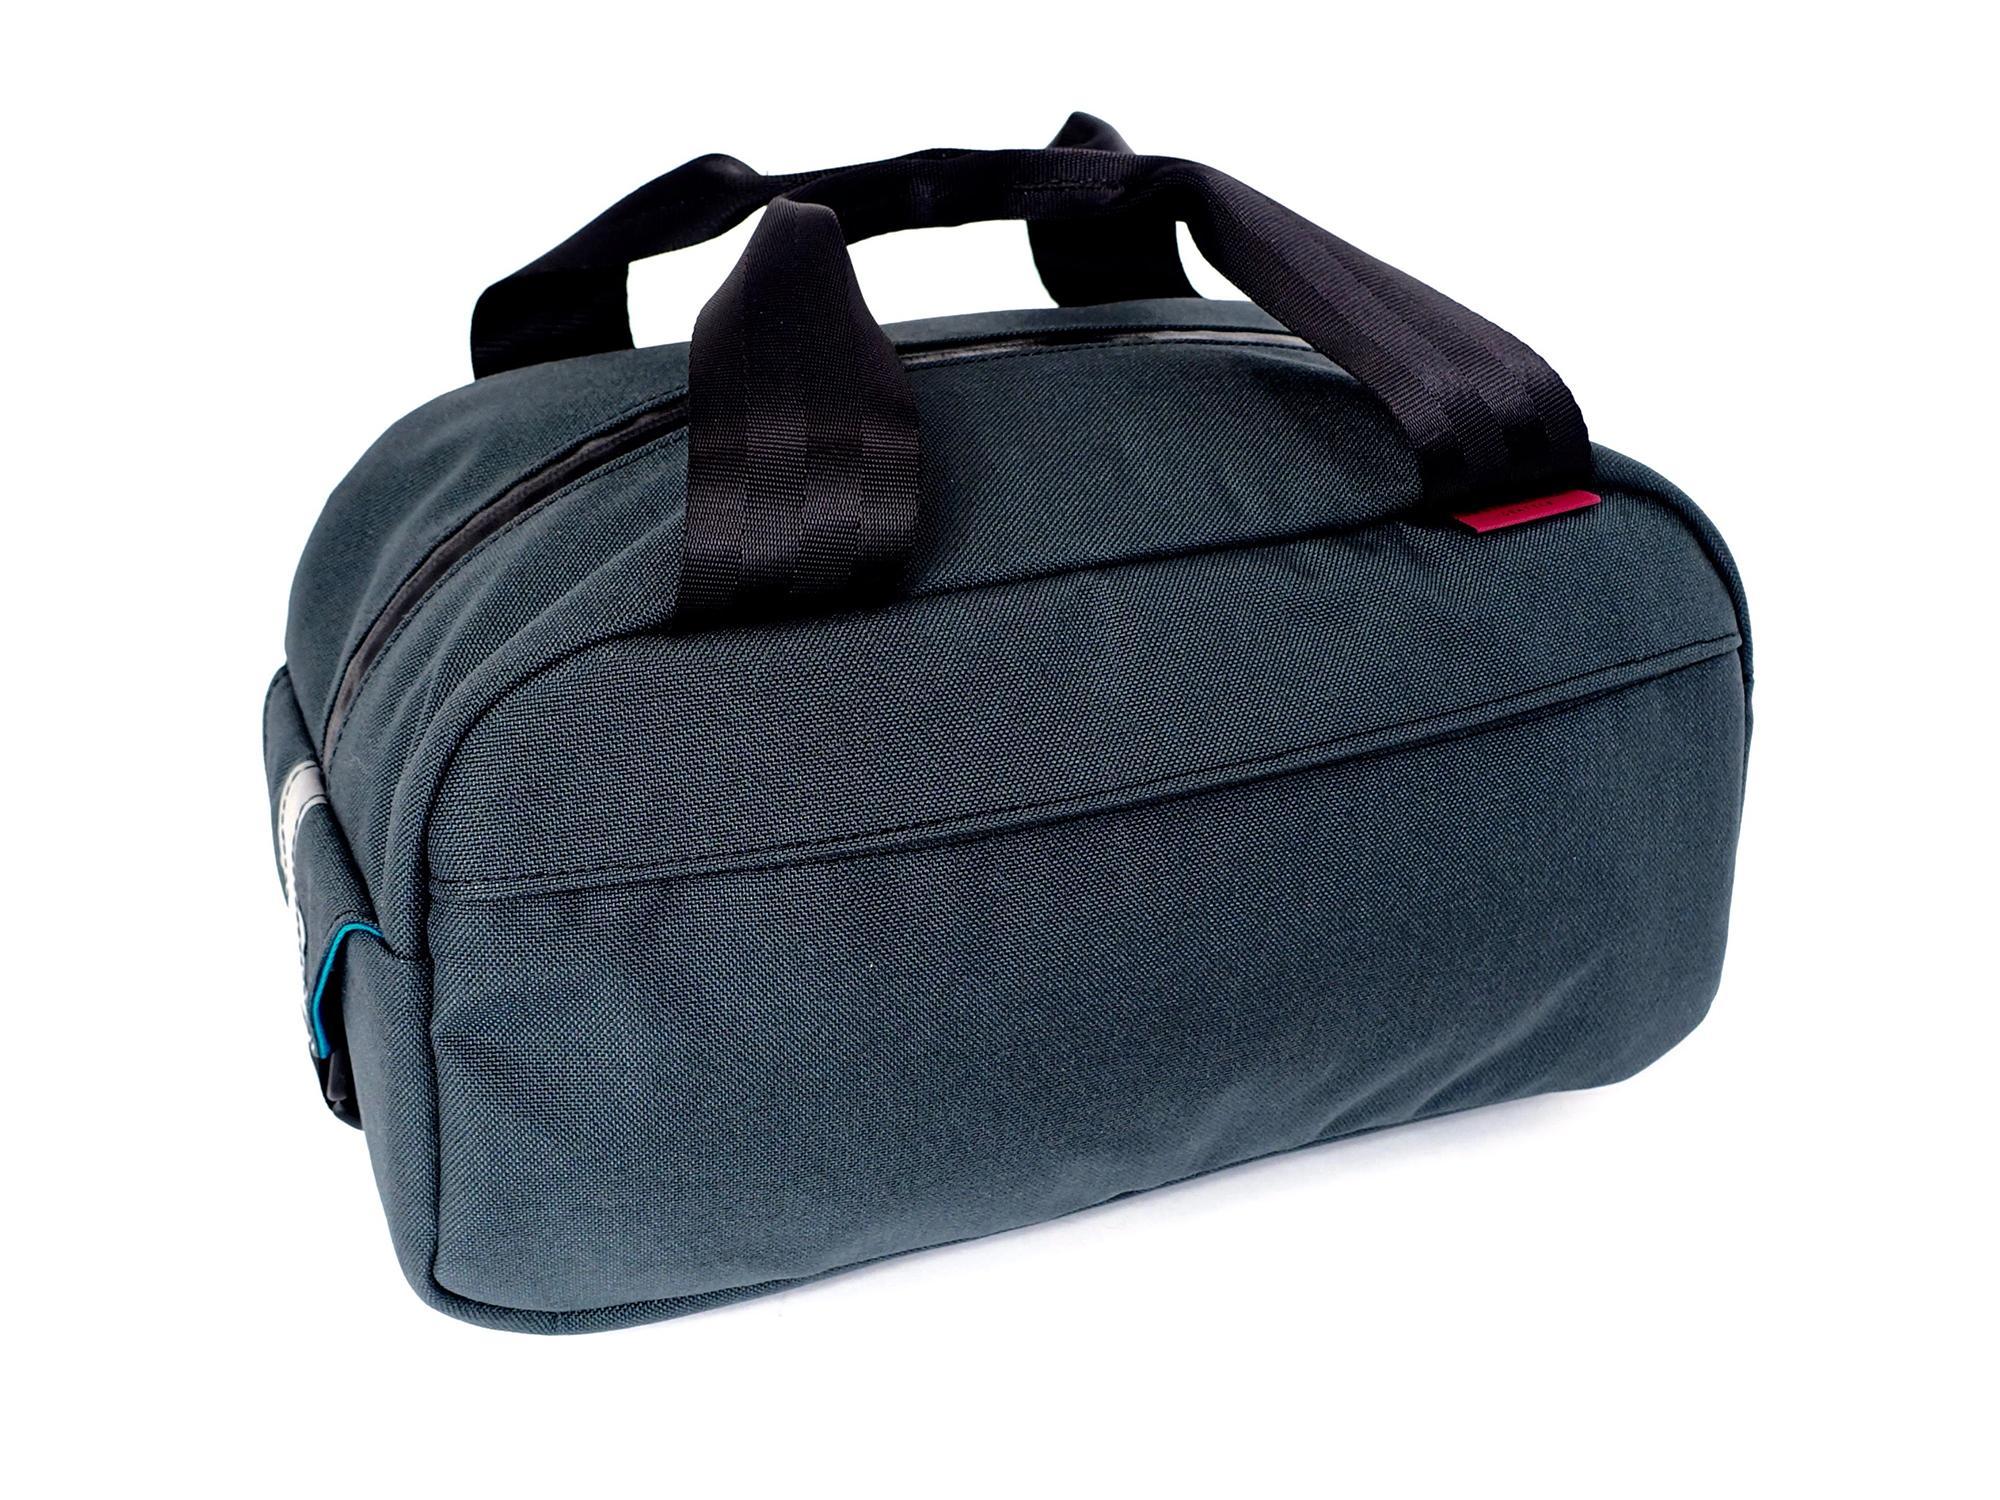 swift-sugarloaf-basket-bag_30050568885_o